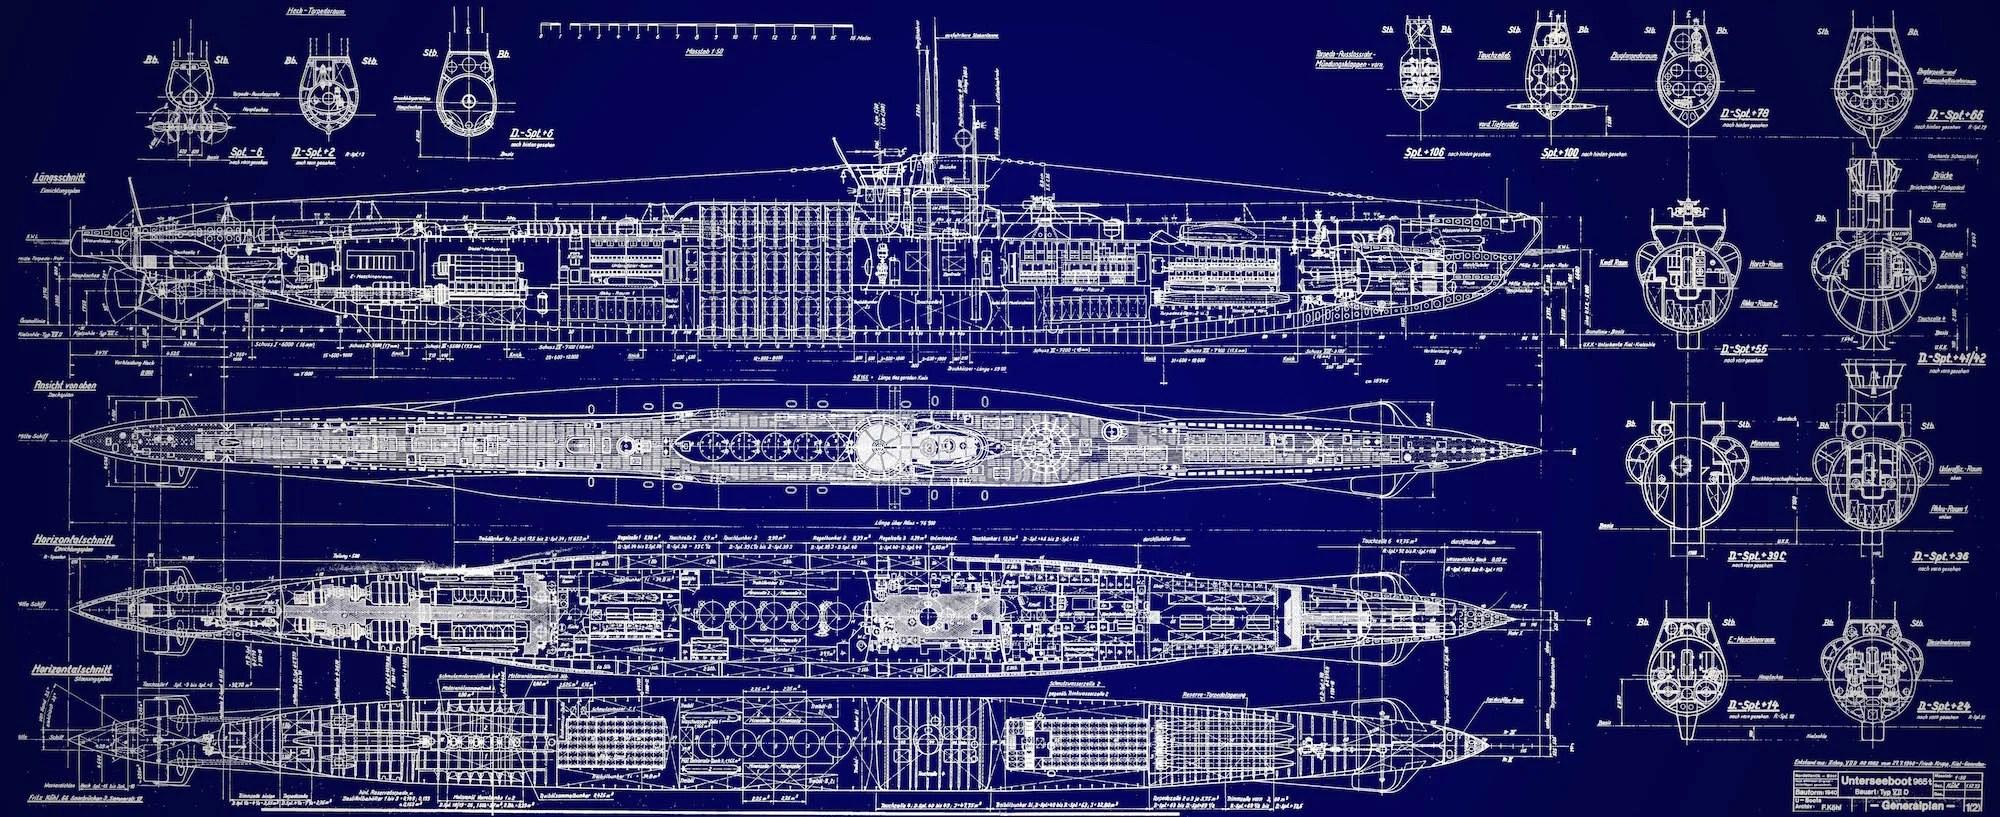 titanic boat diagram ford 8n alternator wiring u-boat blueprints